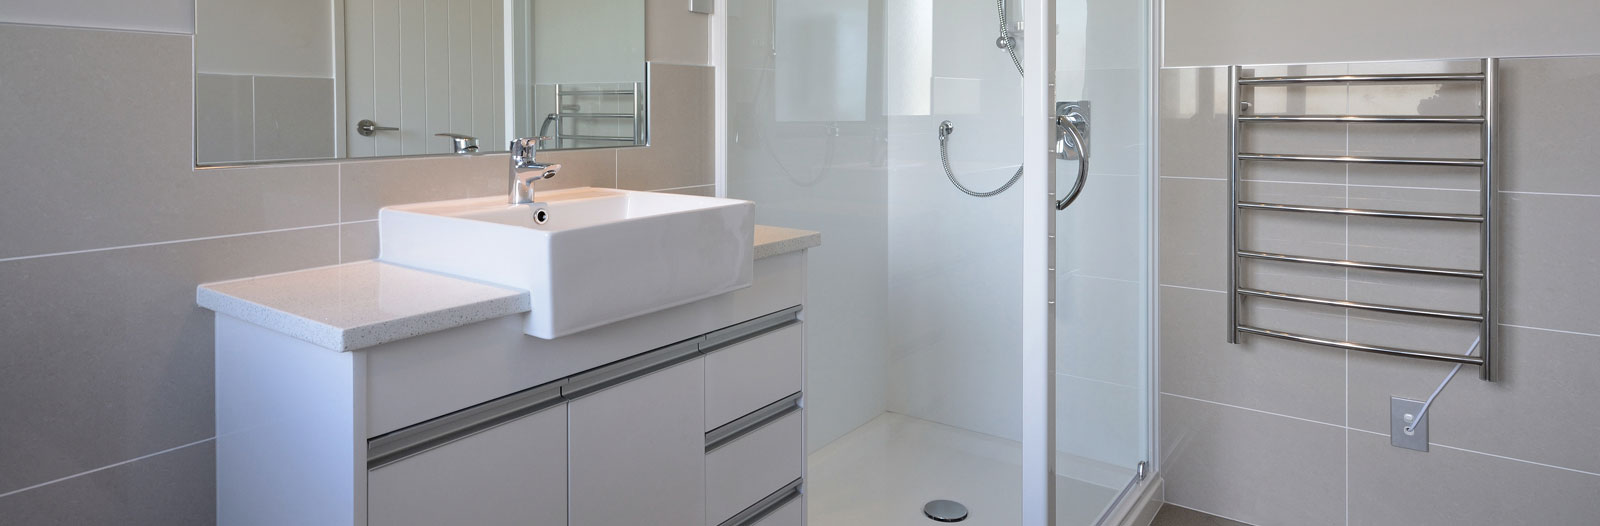 ... 3 In 1 Heater Lights Bathroom by Ventair ... & 100+ [ 3 In 1 Heater Lights Bathroom ]   Dyna Glo Ir30nmdg 1 30 ... azcodes.com